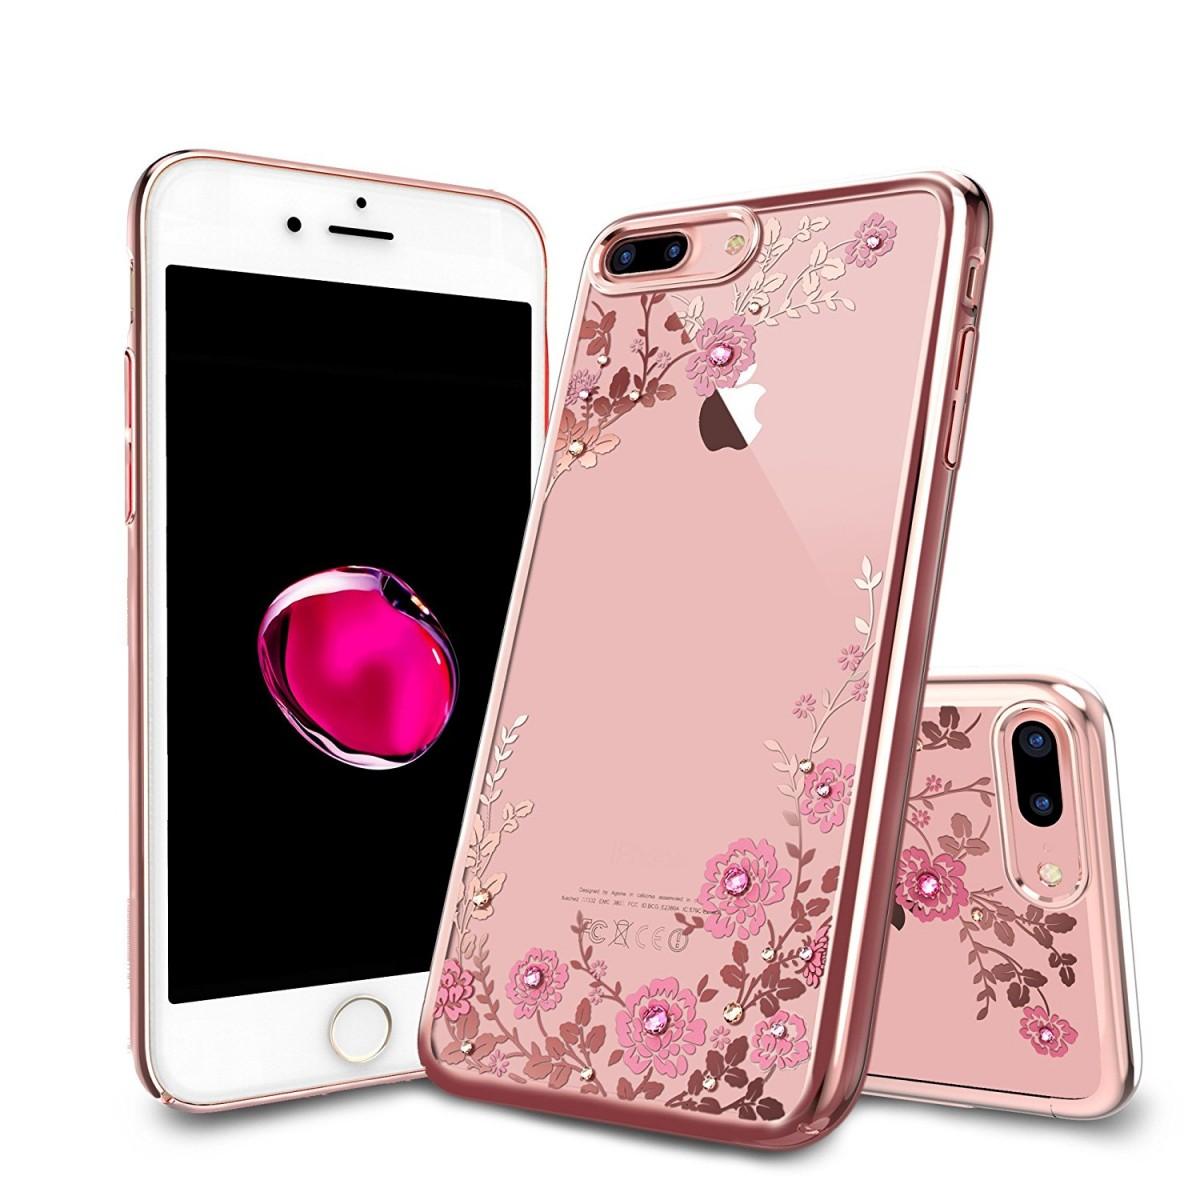 Obal / kryt Crystal Flowers pro iPhone 7 Plus (rose gold)